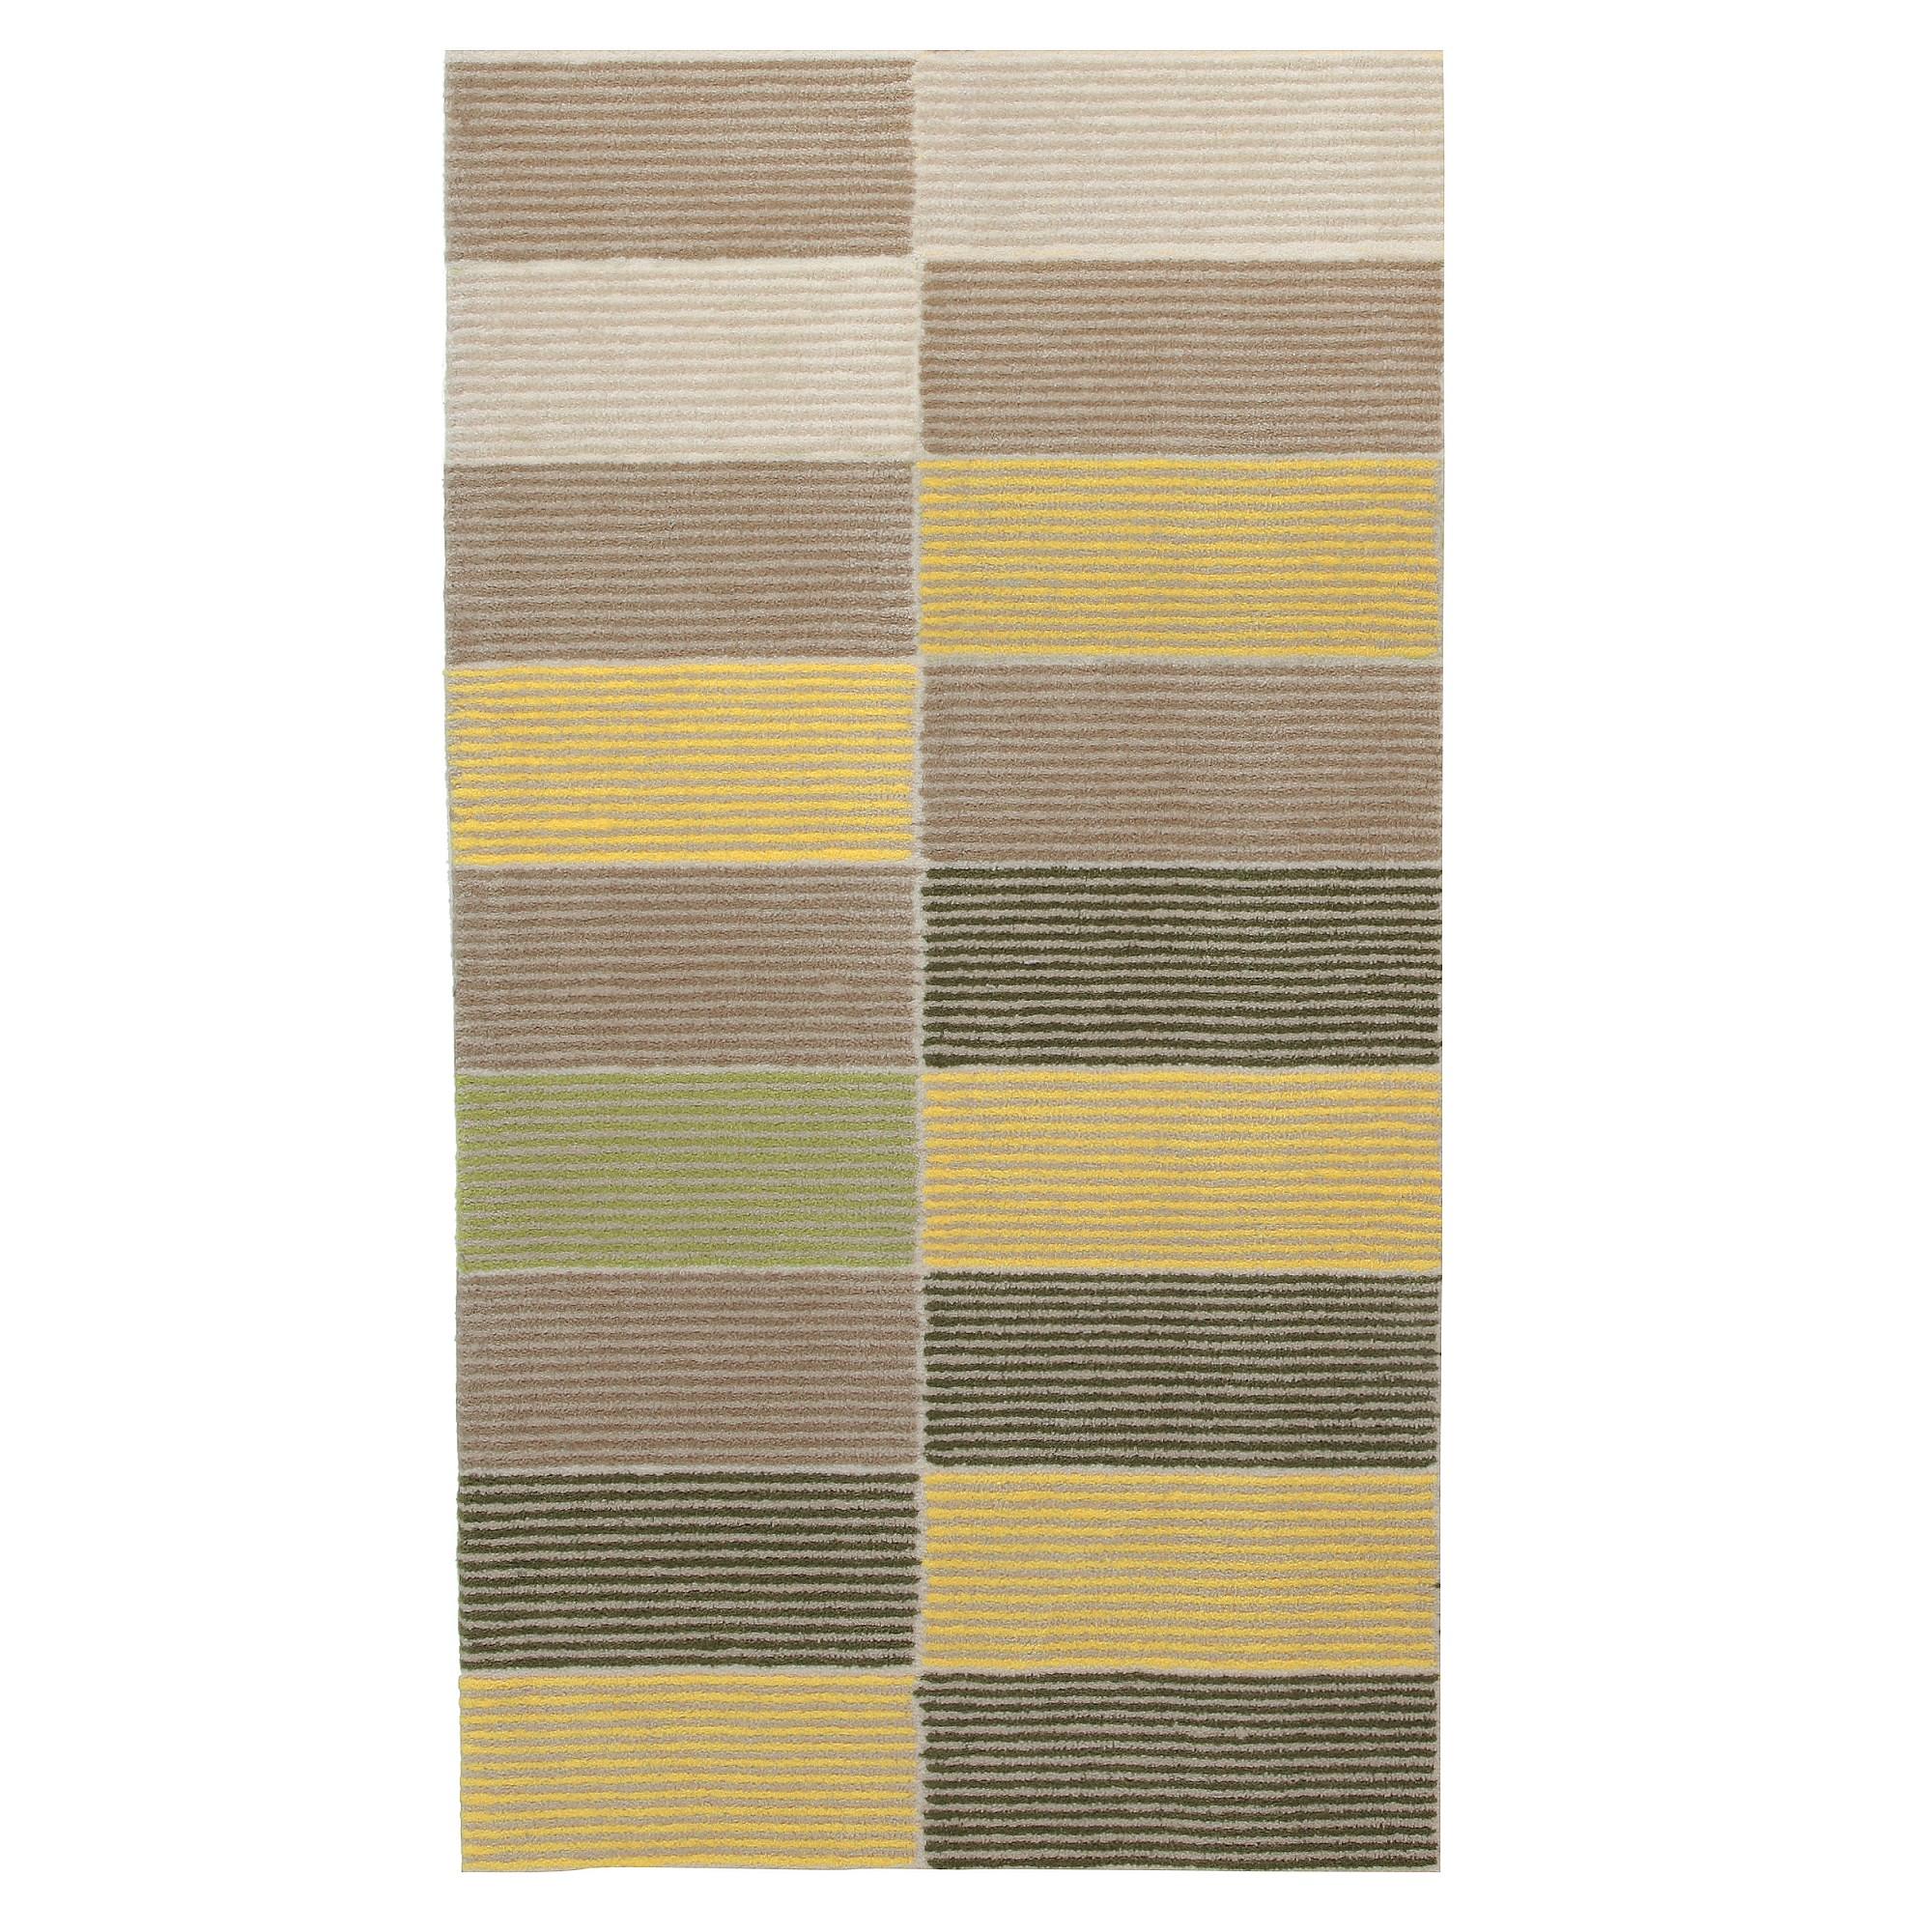 Teppich Fida - Gelb - 70 x 140 cm, Esprit Home